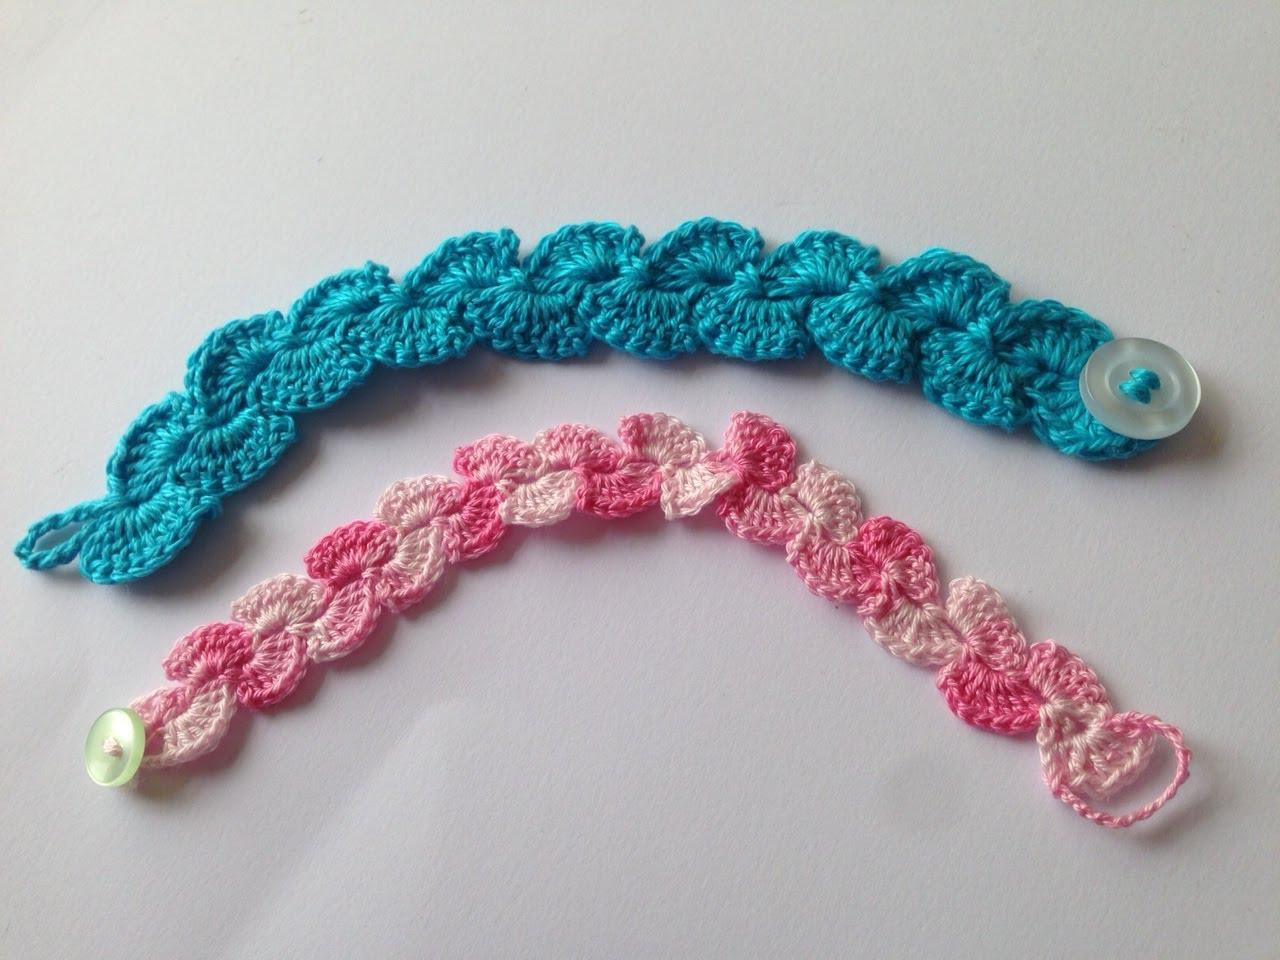 crochet bracelet how to crochet easy and beautiful bracelet - youtube arthgec